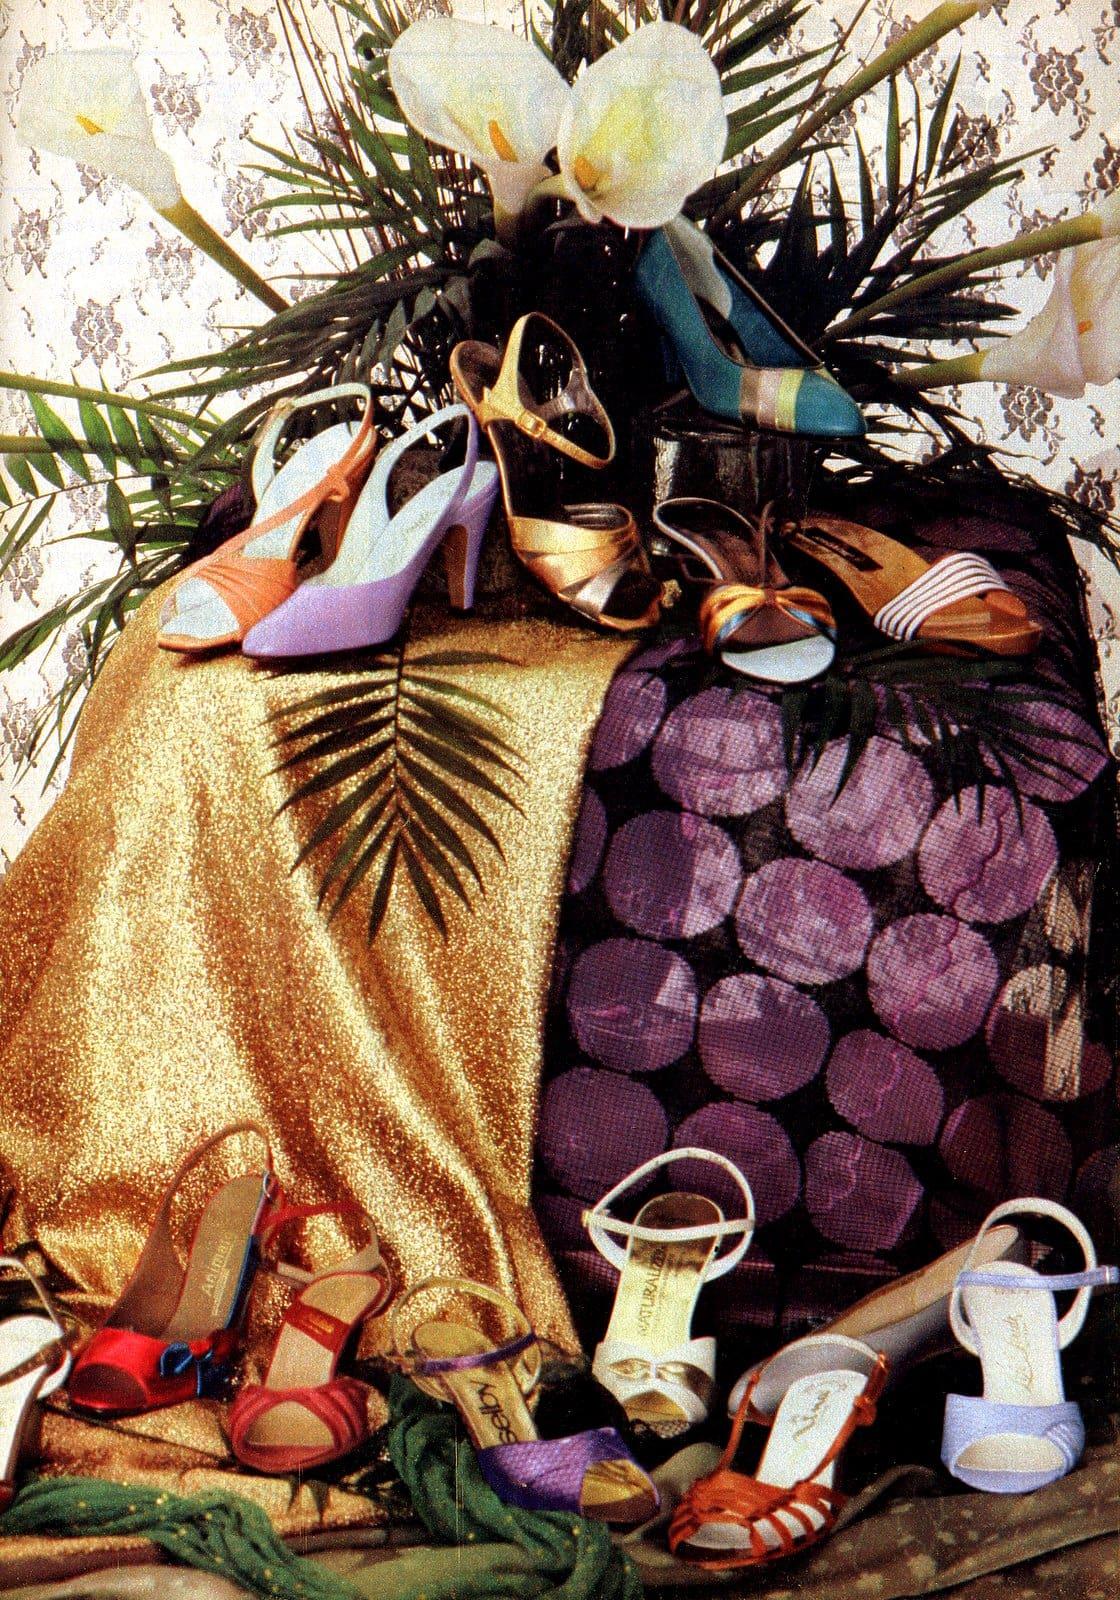 Retro 80s womens shoe display (1982)